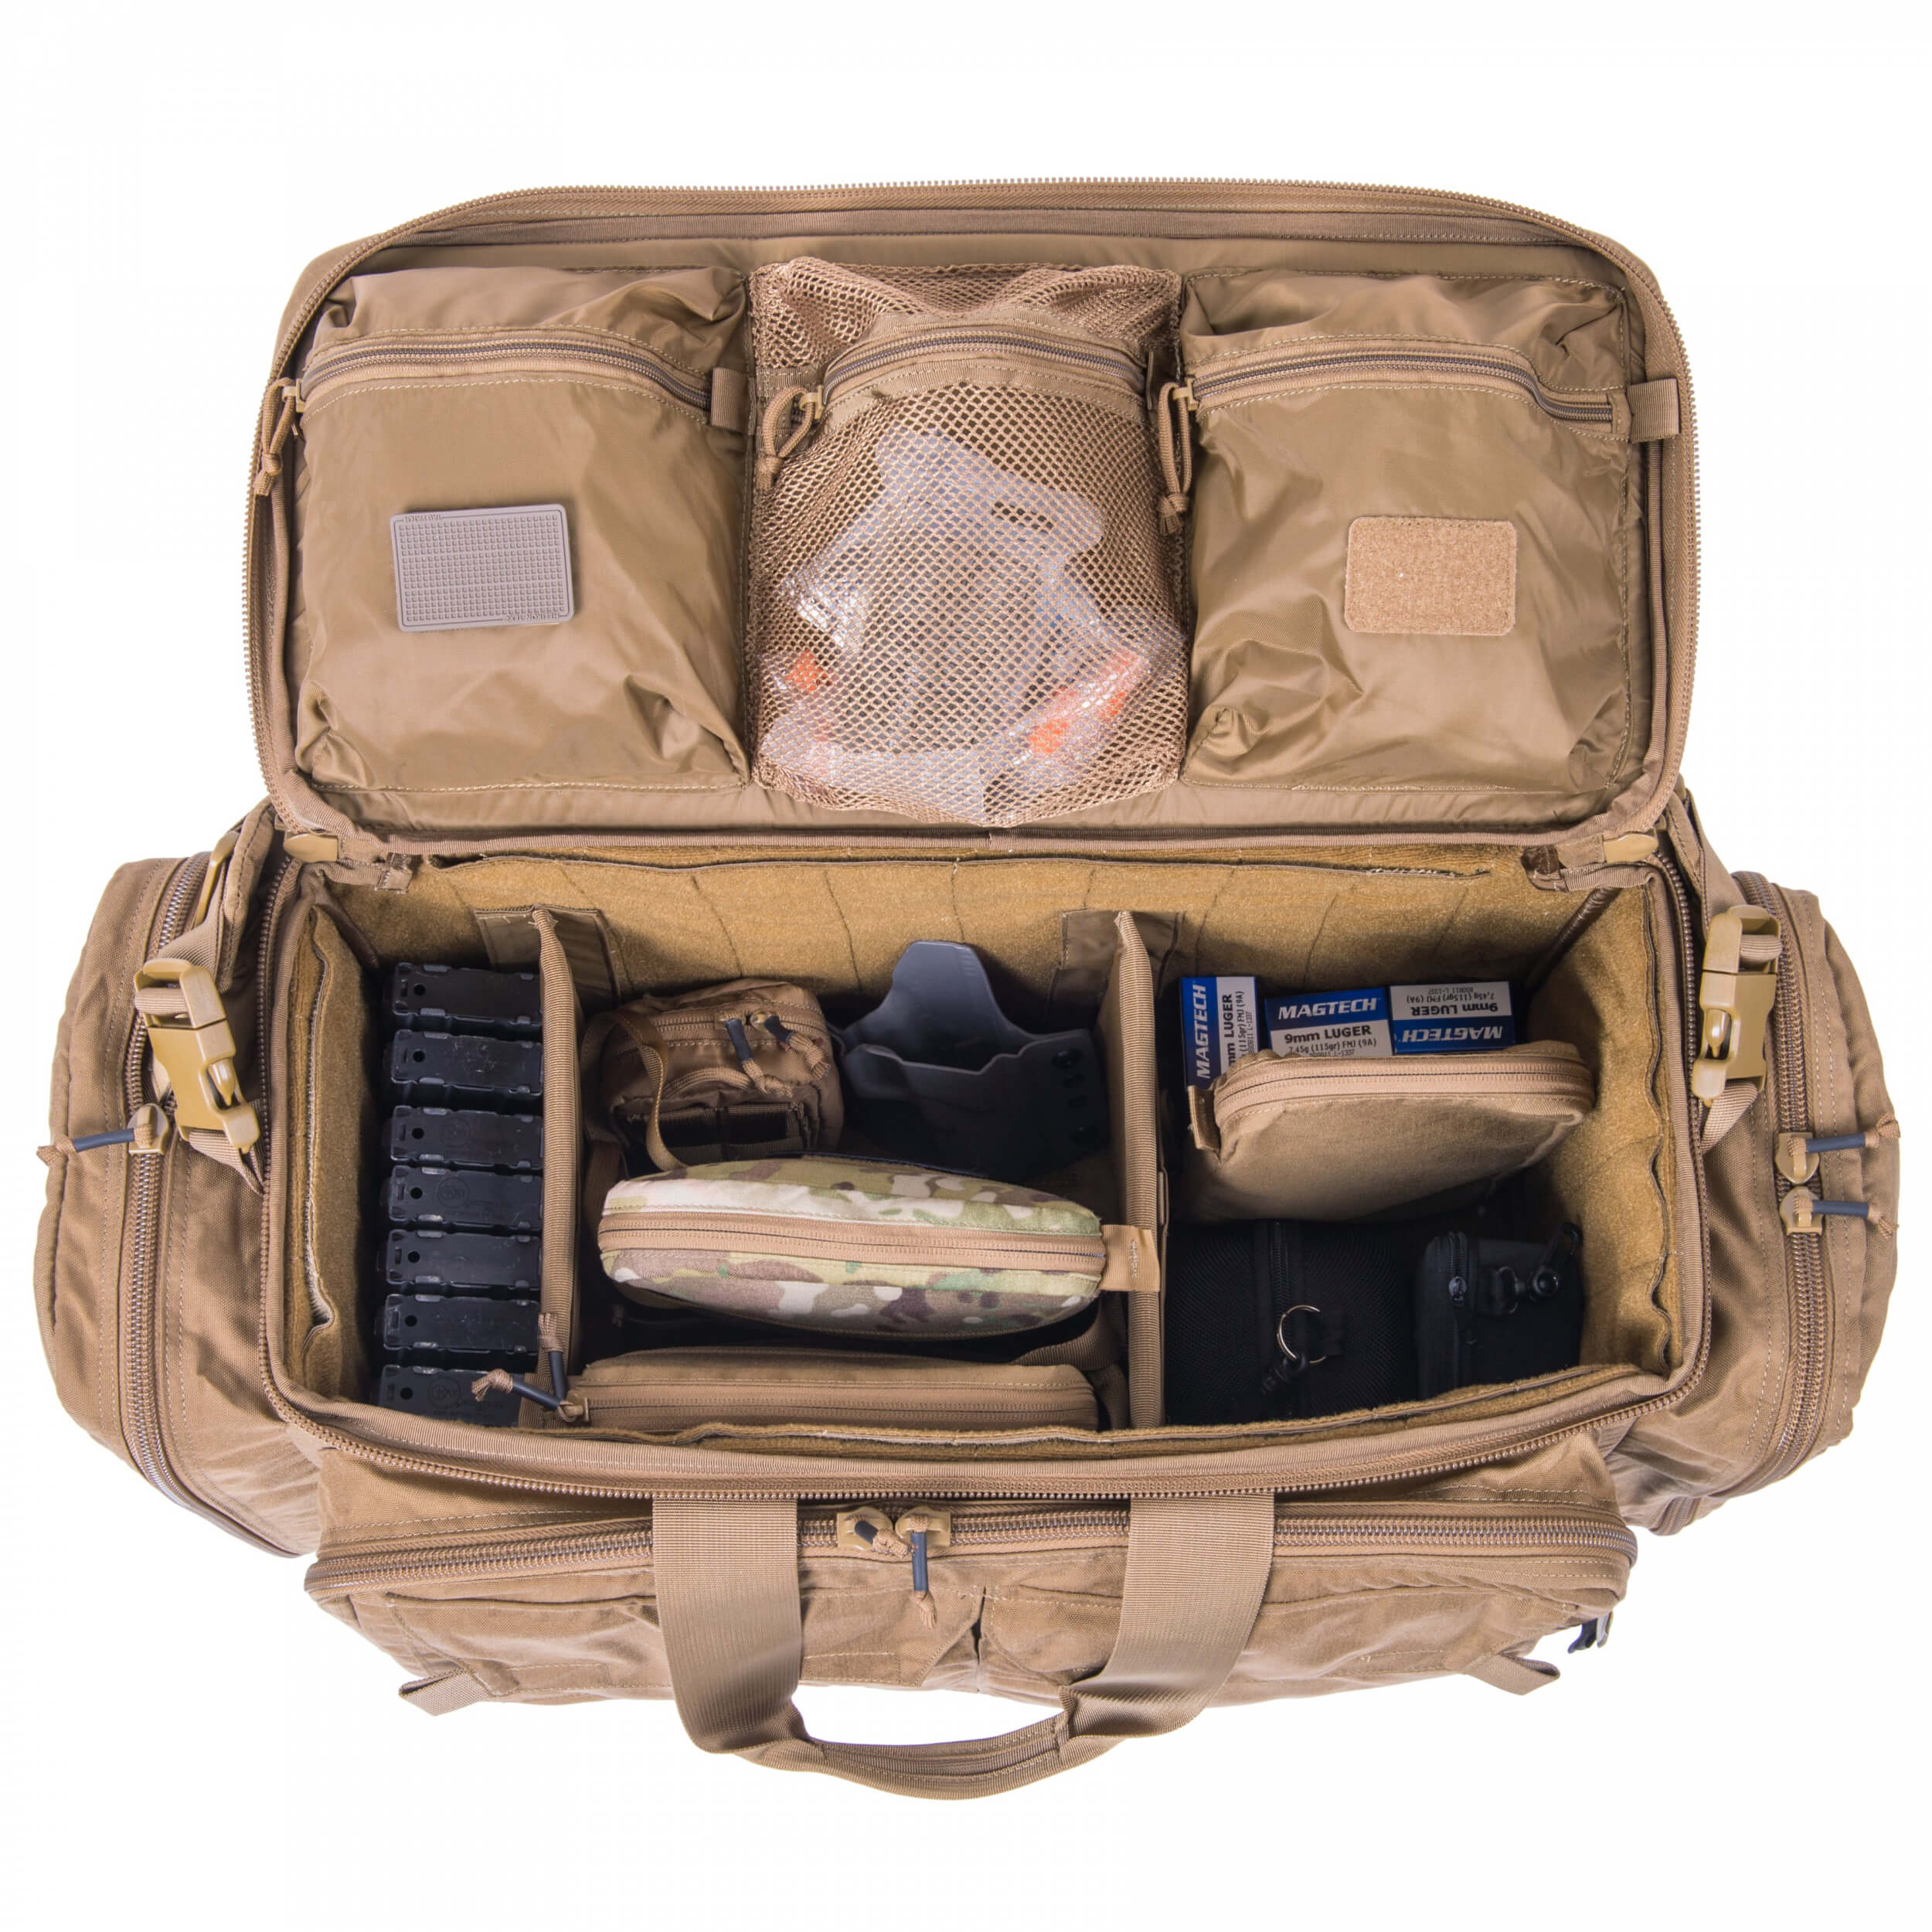 Helikon-Tex RANGEMASTER Gear Bag -Cordura- Schwarz